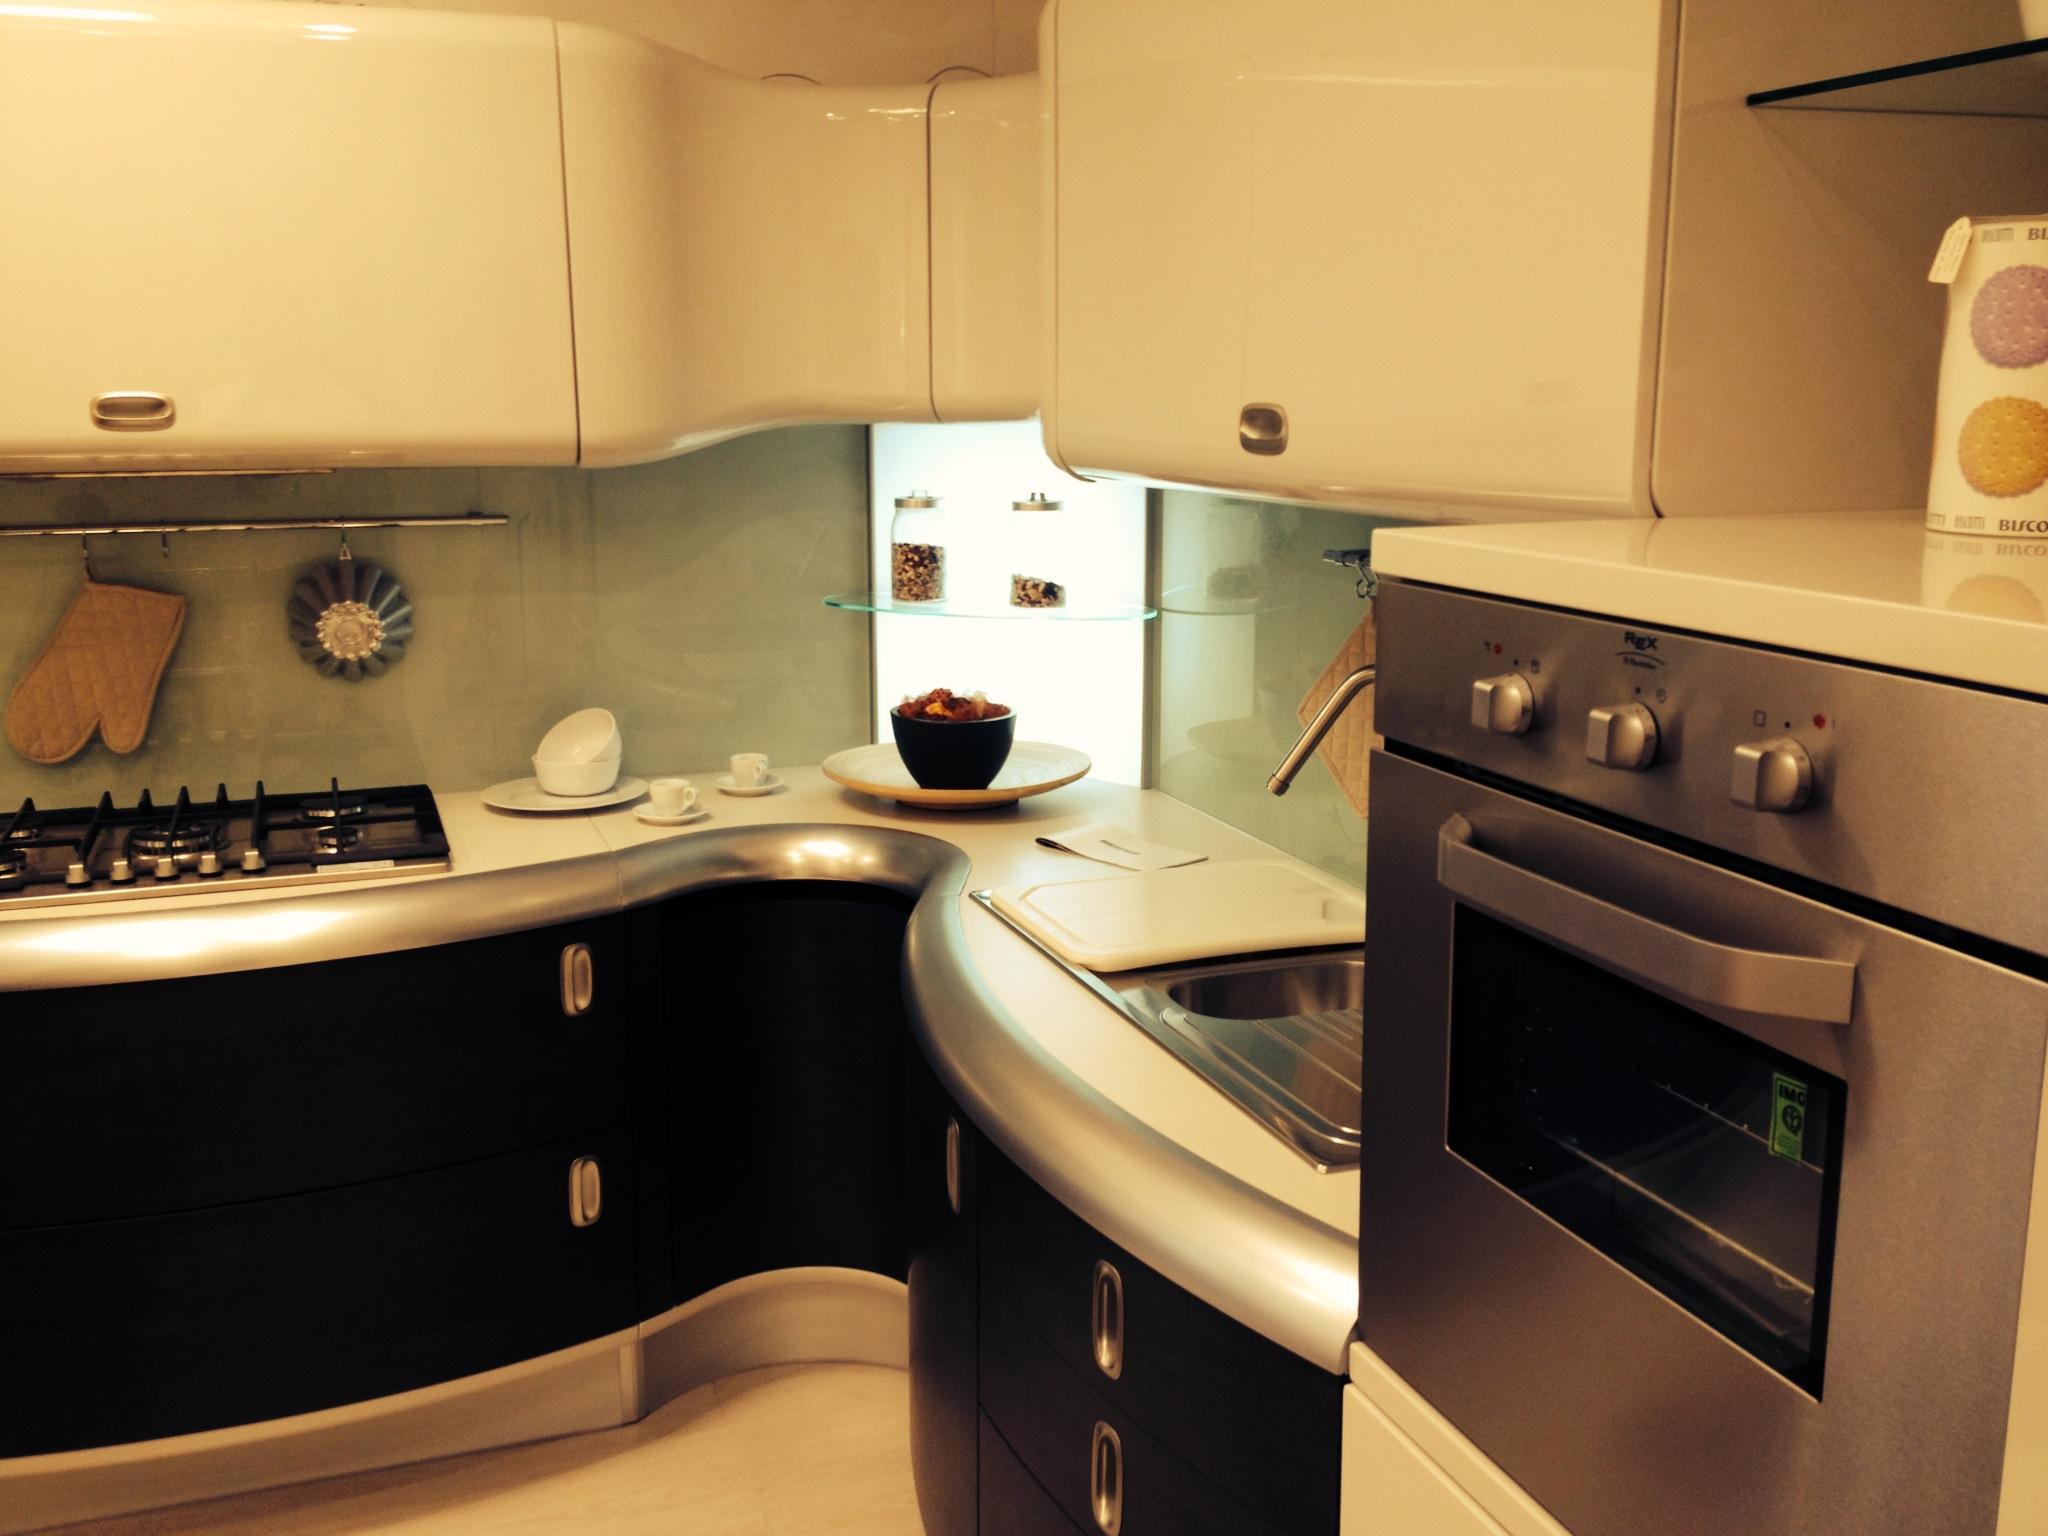 Outlet arredamento e cucine di design cucina giemmegi for Arredamento di design outlet